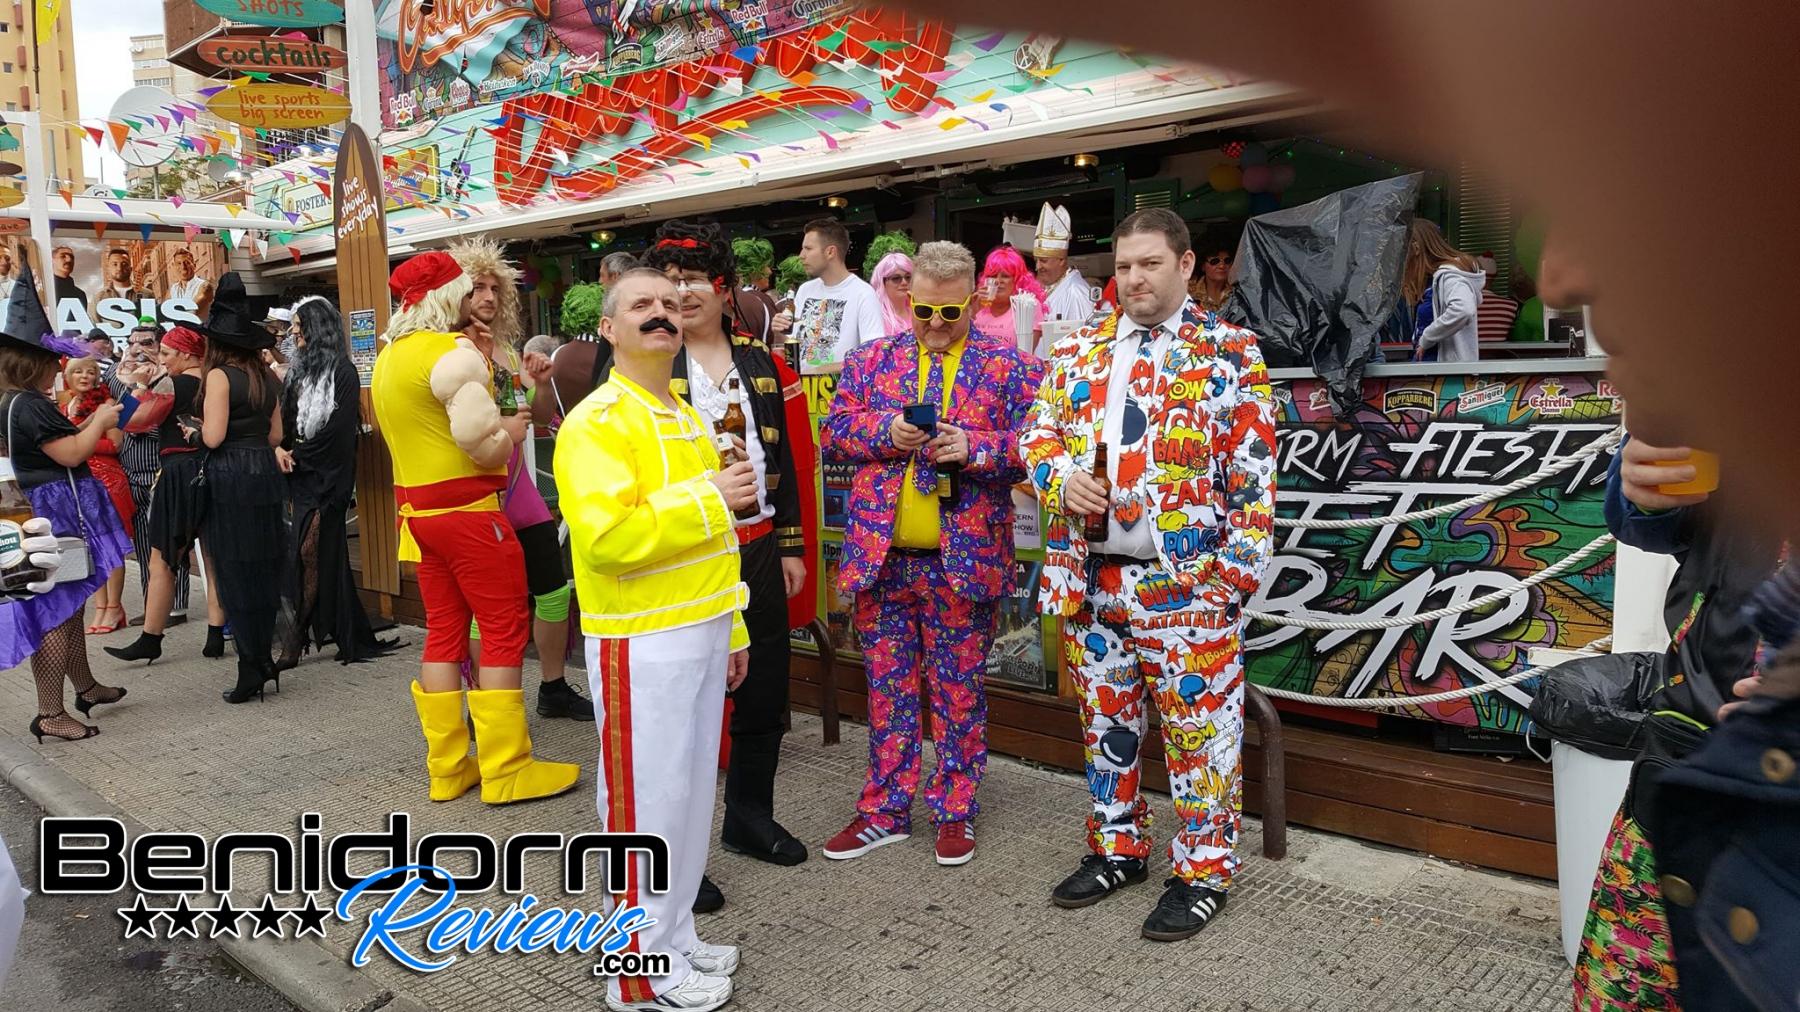 Benidorm-Fiestas-2019-Fancy-Dress-129